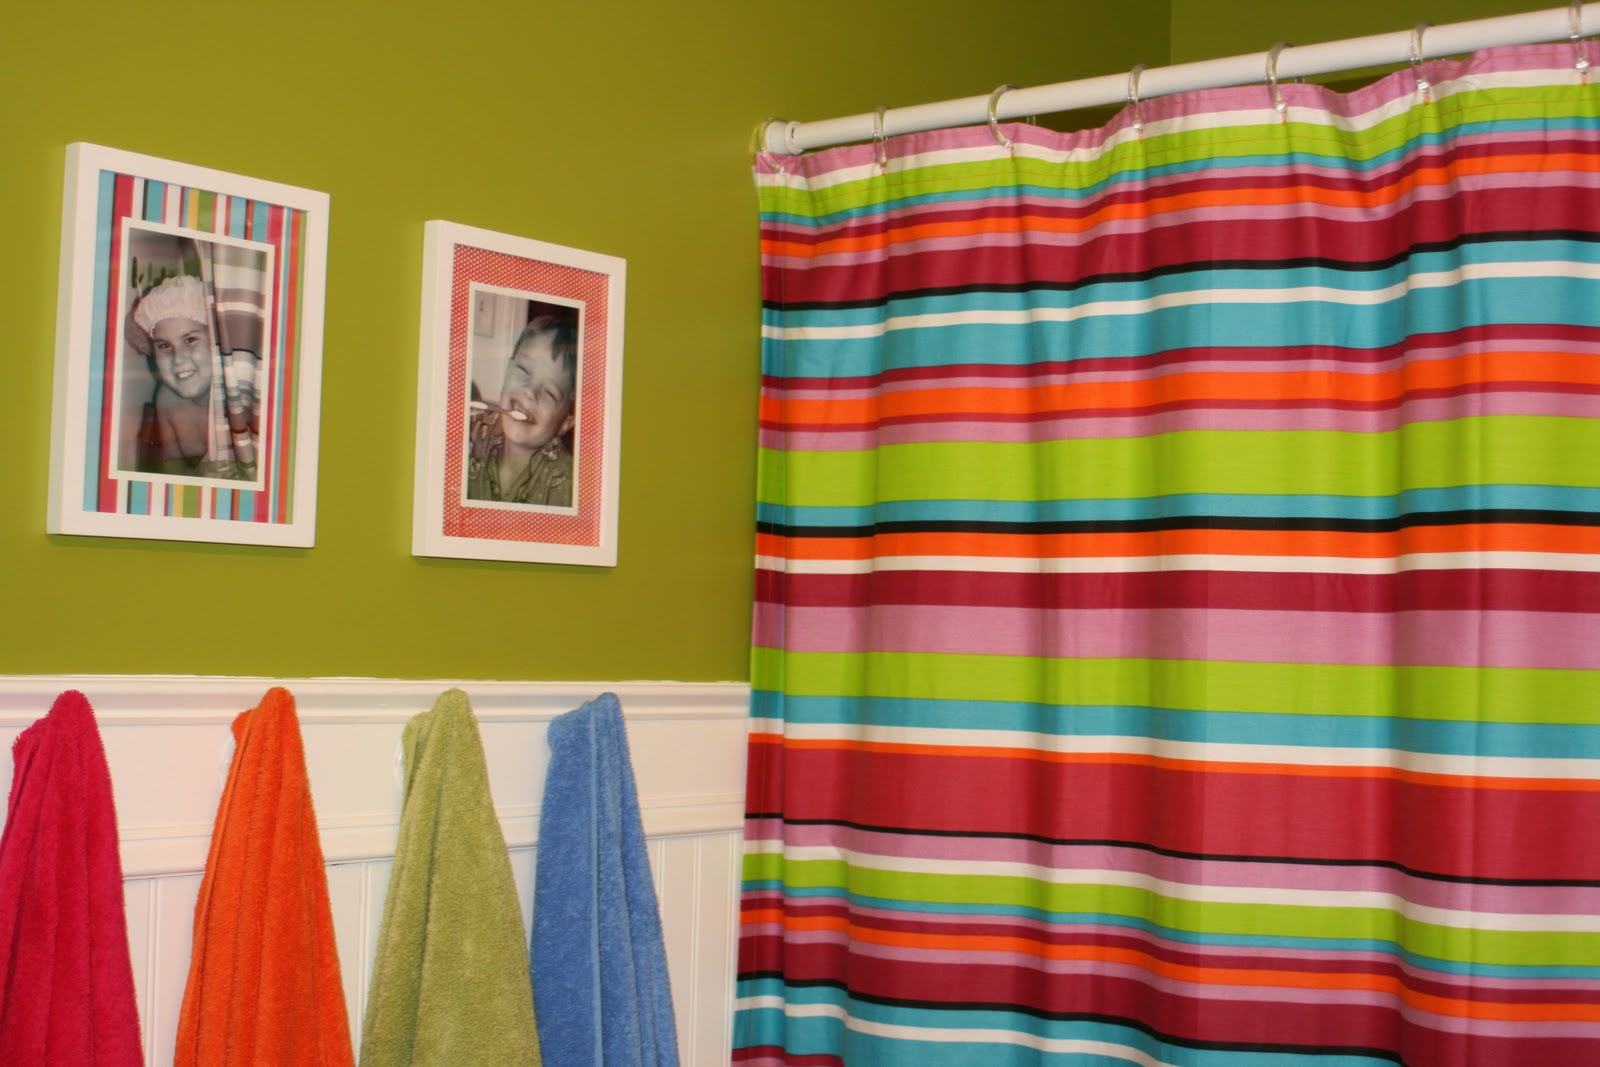 Curtains Ideas target kids shower curtain : ... Shower Curtains Target | Homeminimalis.com - kids bathroom curtains